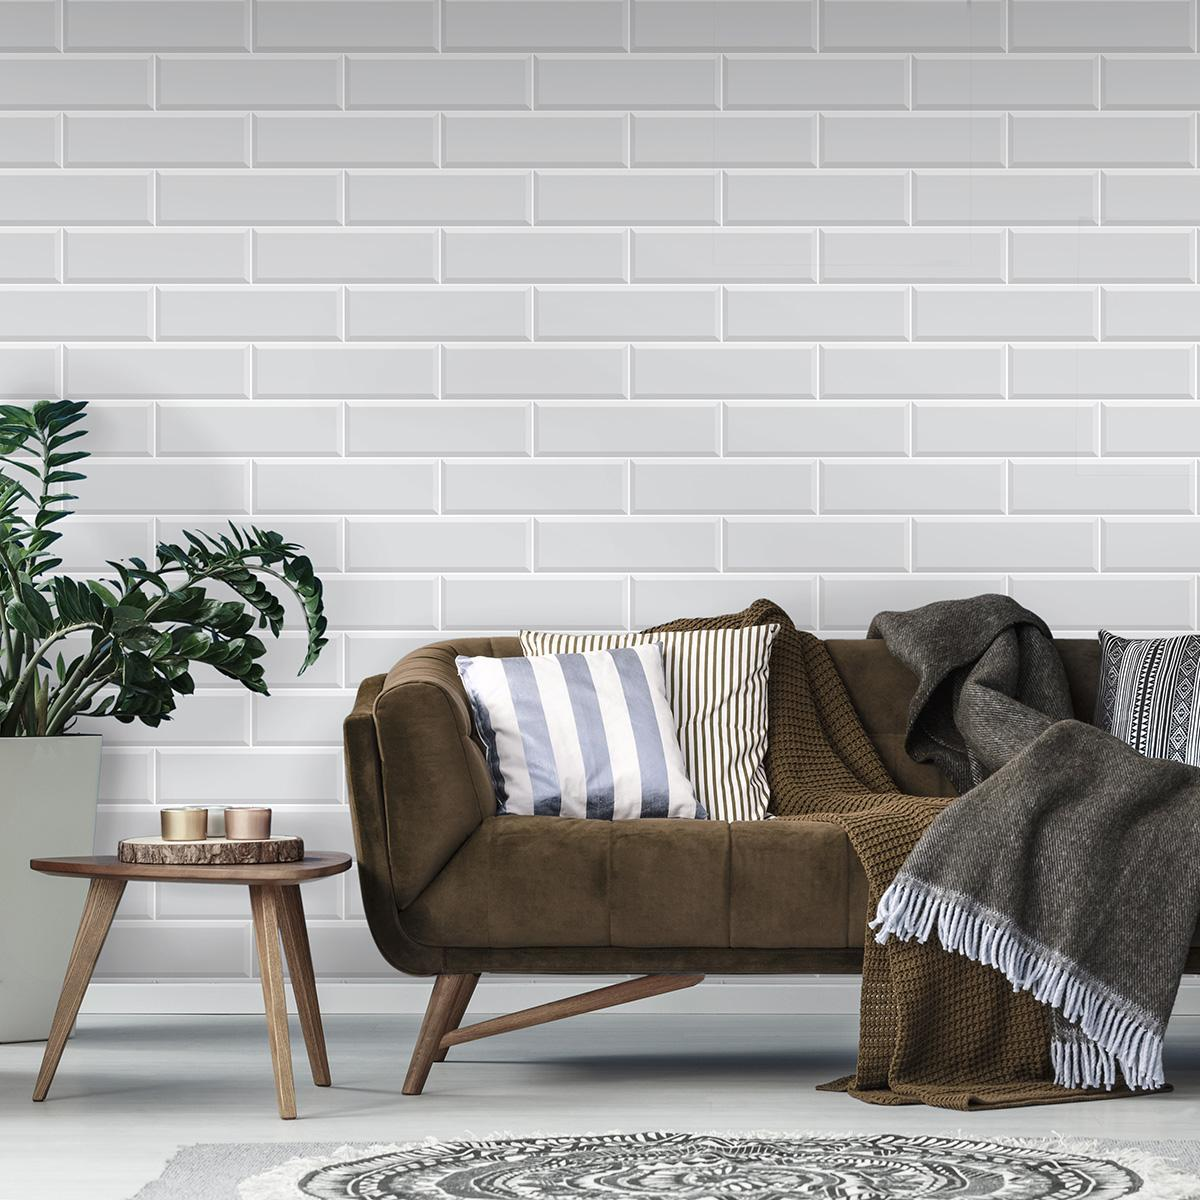 Mayólica Brick Blanco - 12X40 cm - 1.39 m2